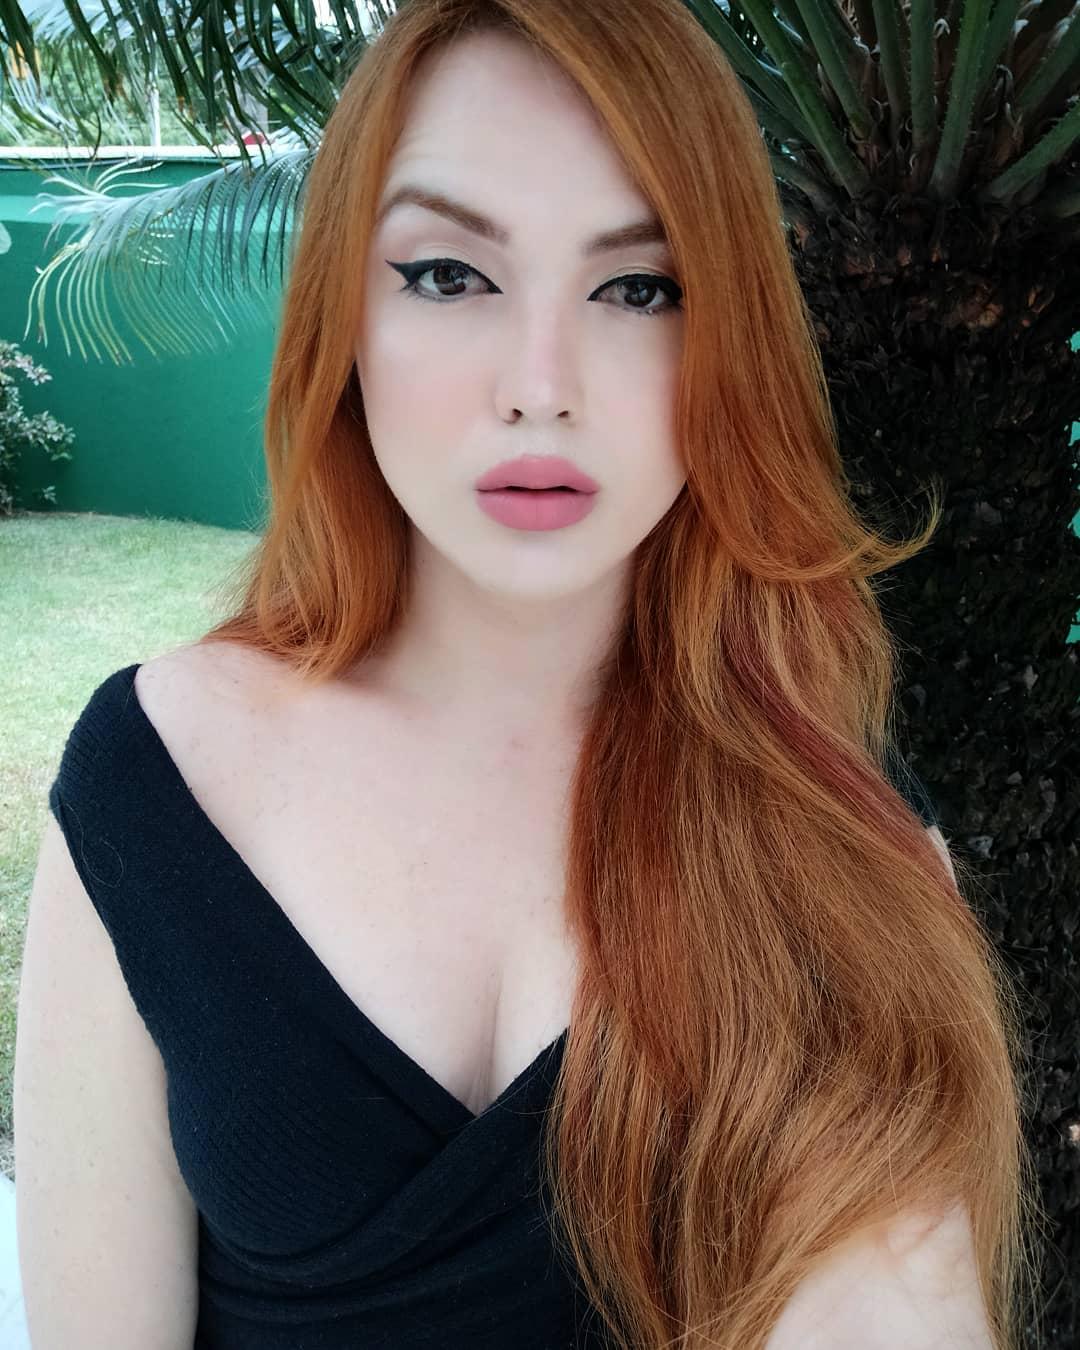 Daniella Barros - Most Beautiful Transgender Woman from